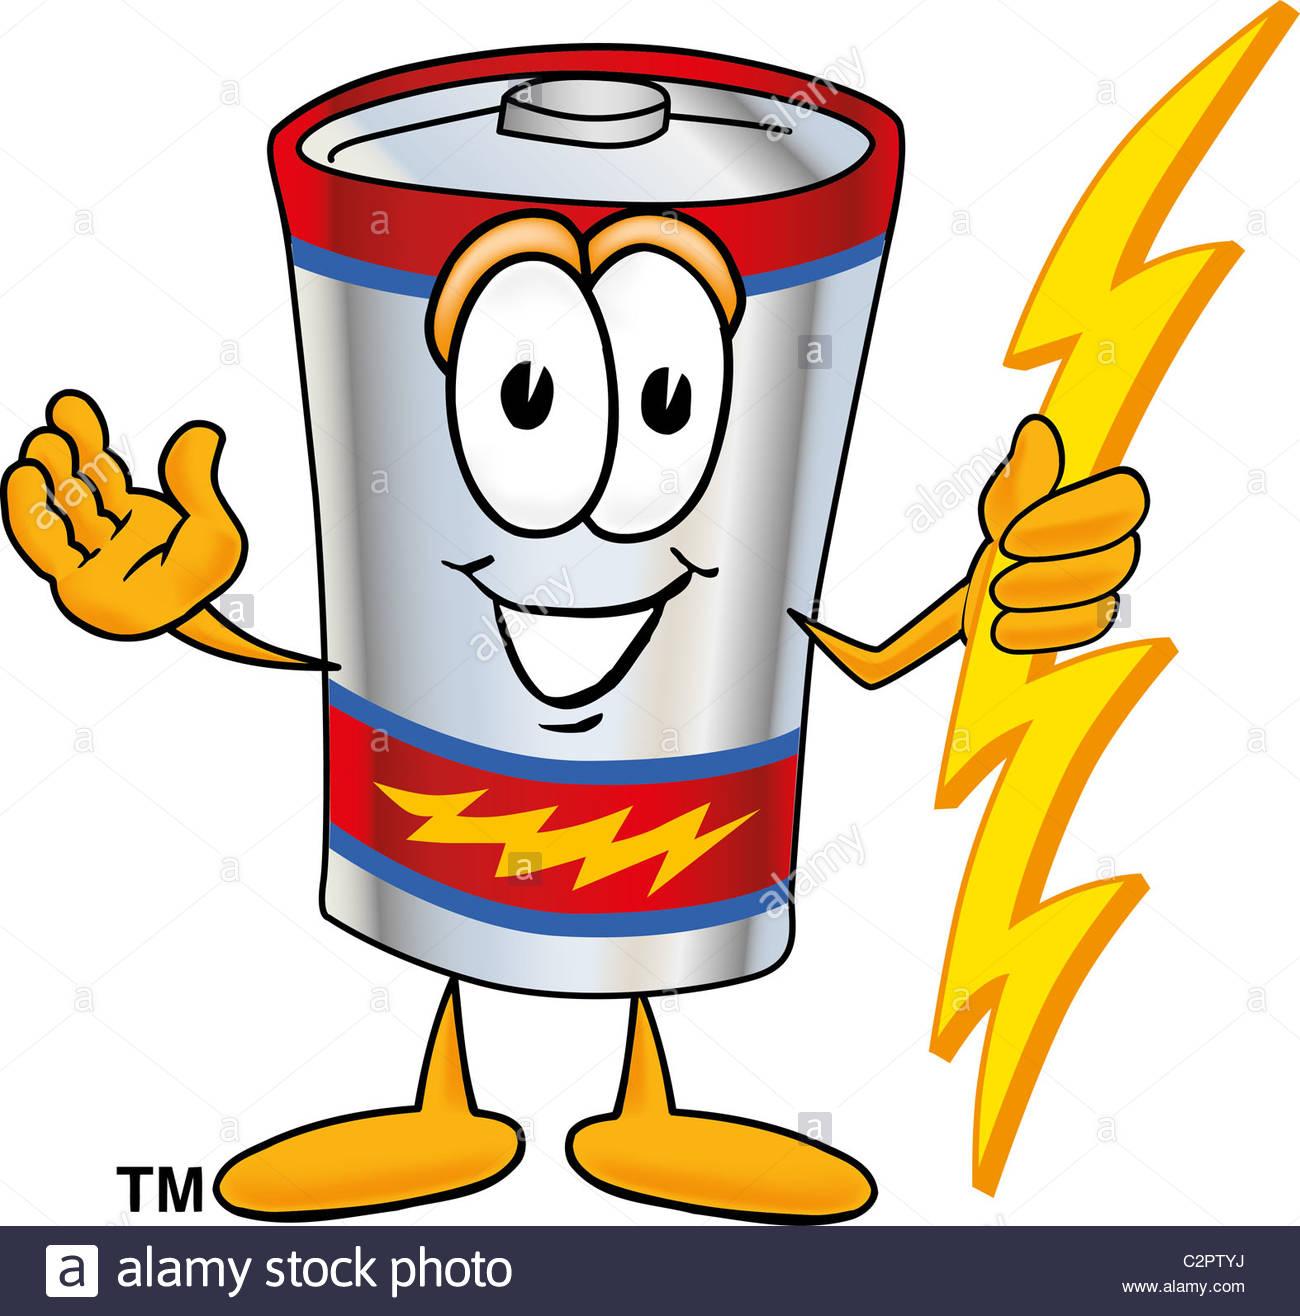 Battery clipart cartoon. Lighting bolt free download